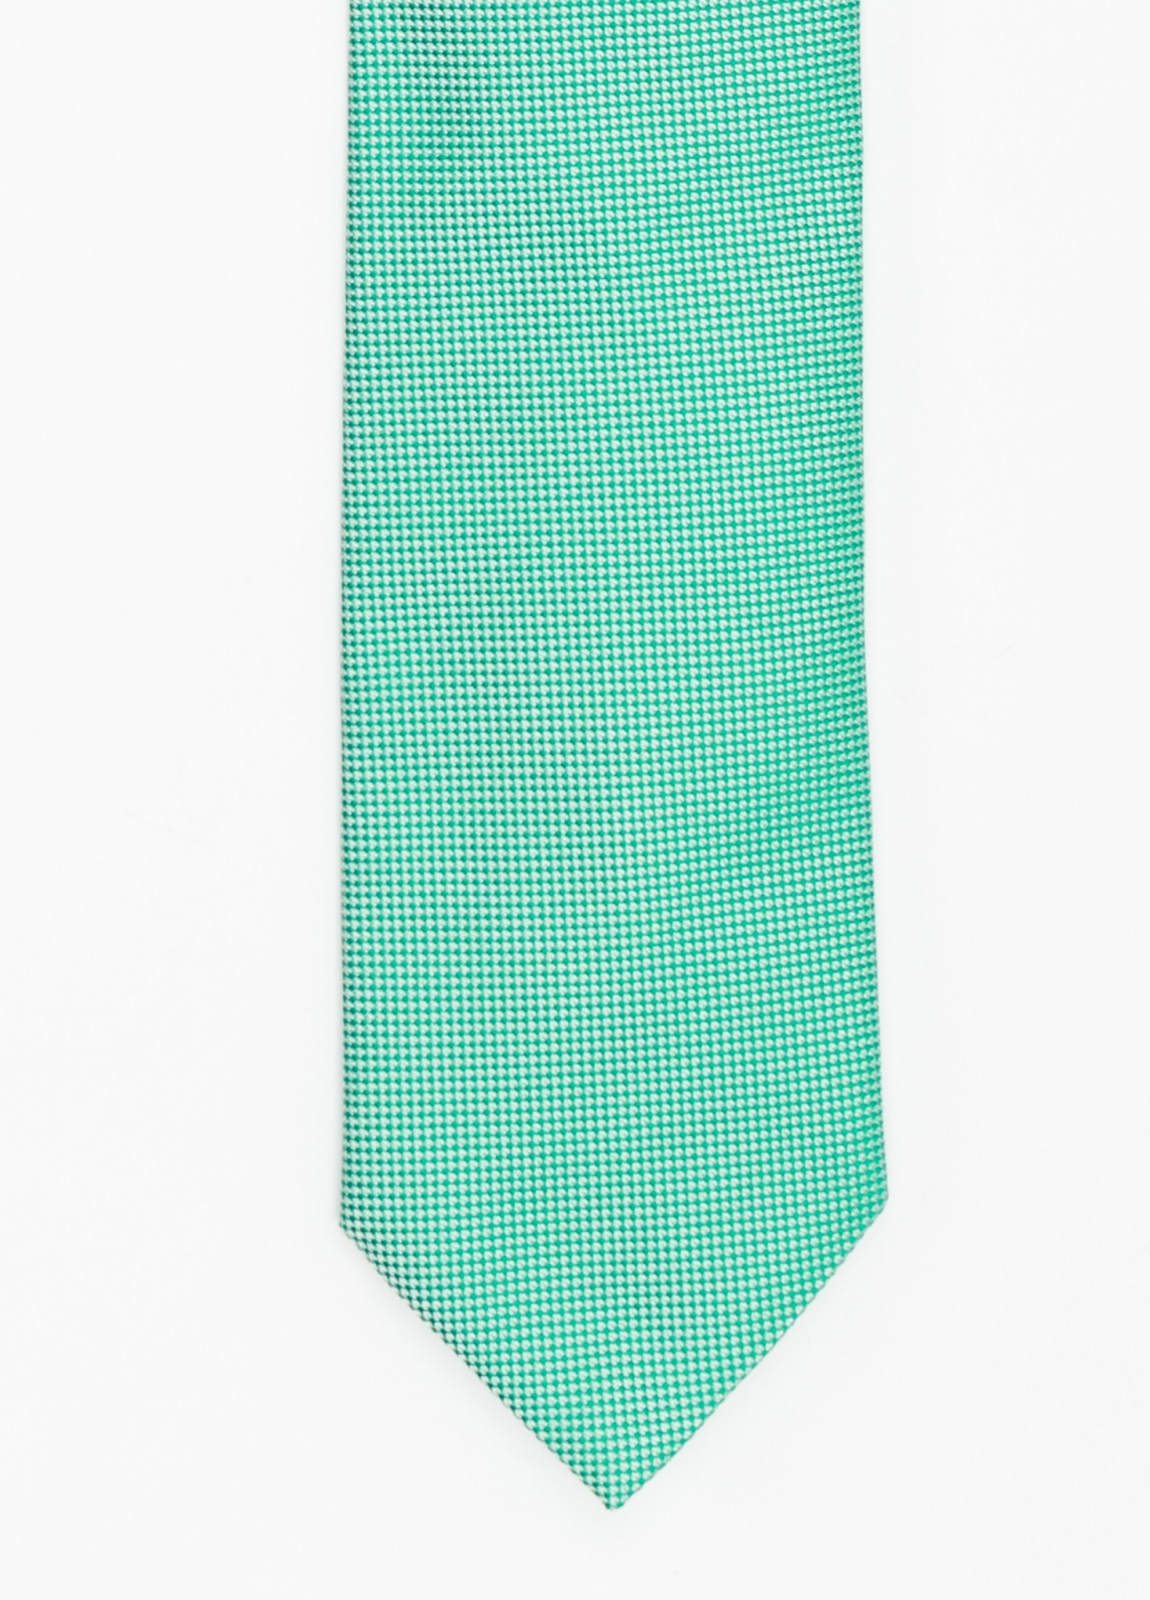 Corbata Formal Wear microtextura color azul verde. Pala 7,5 cm. 100% Seda.